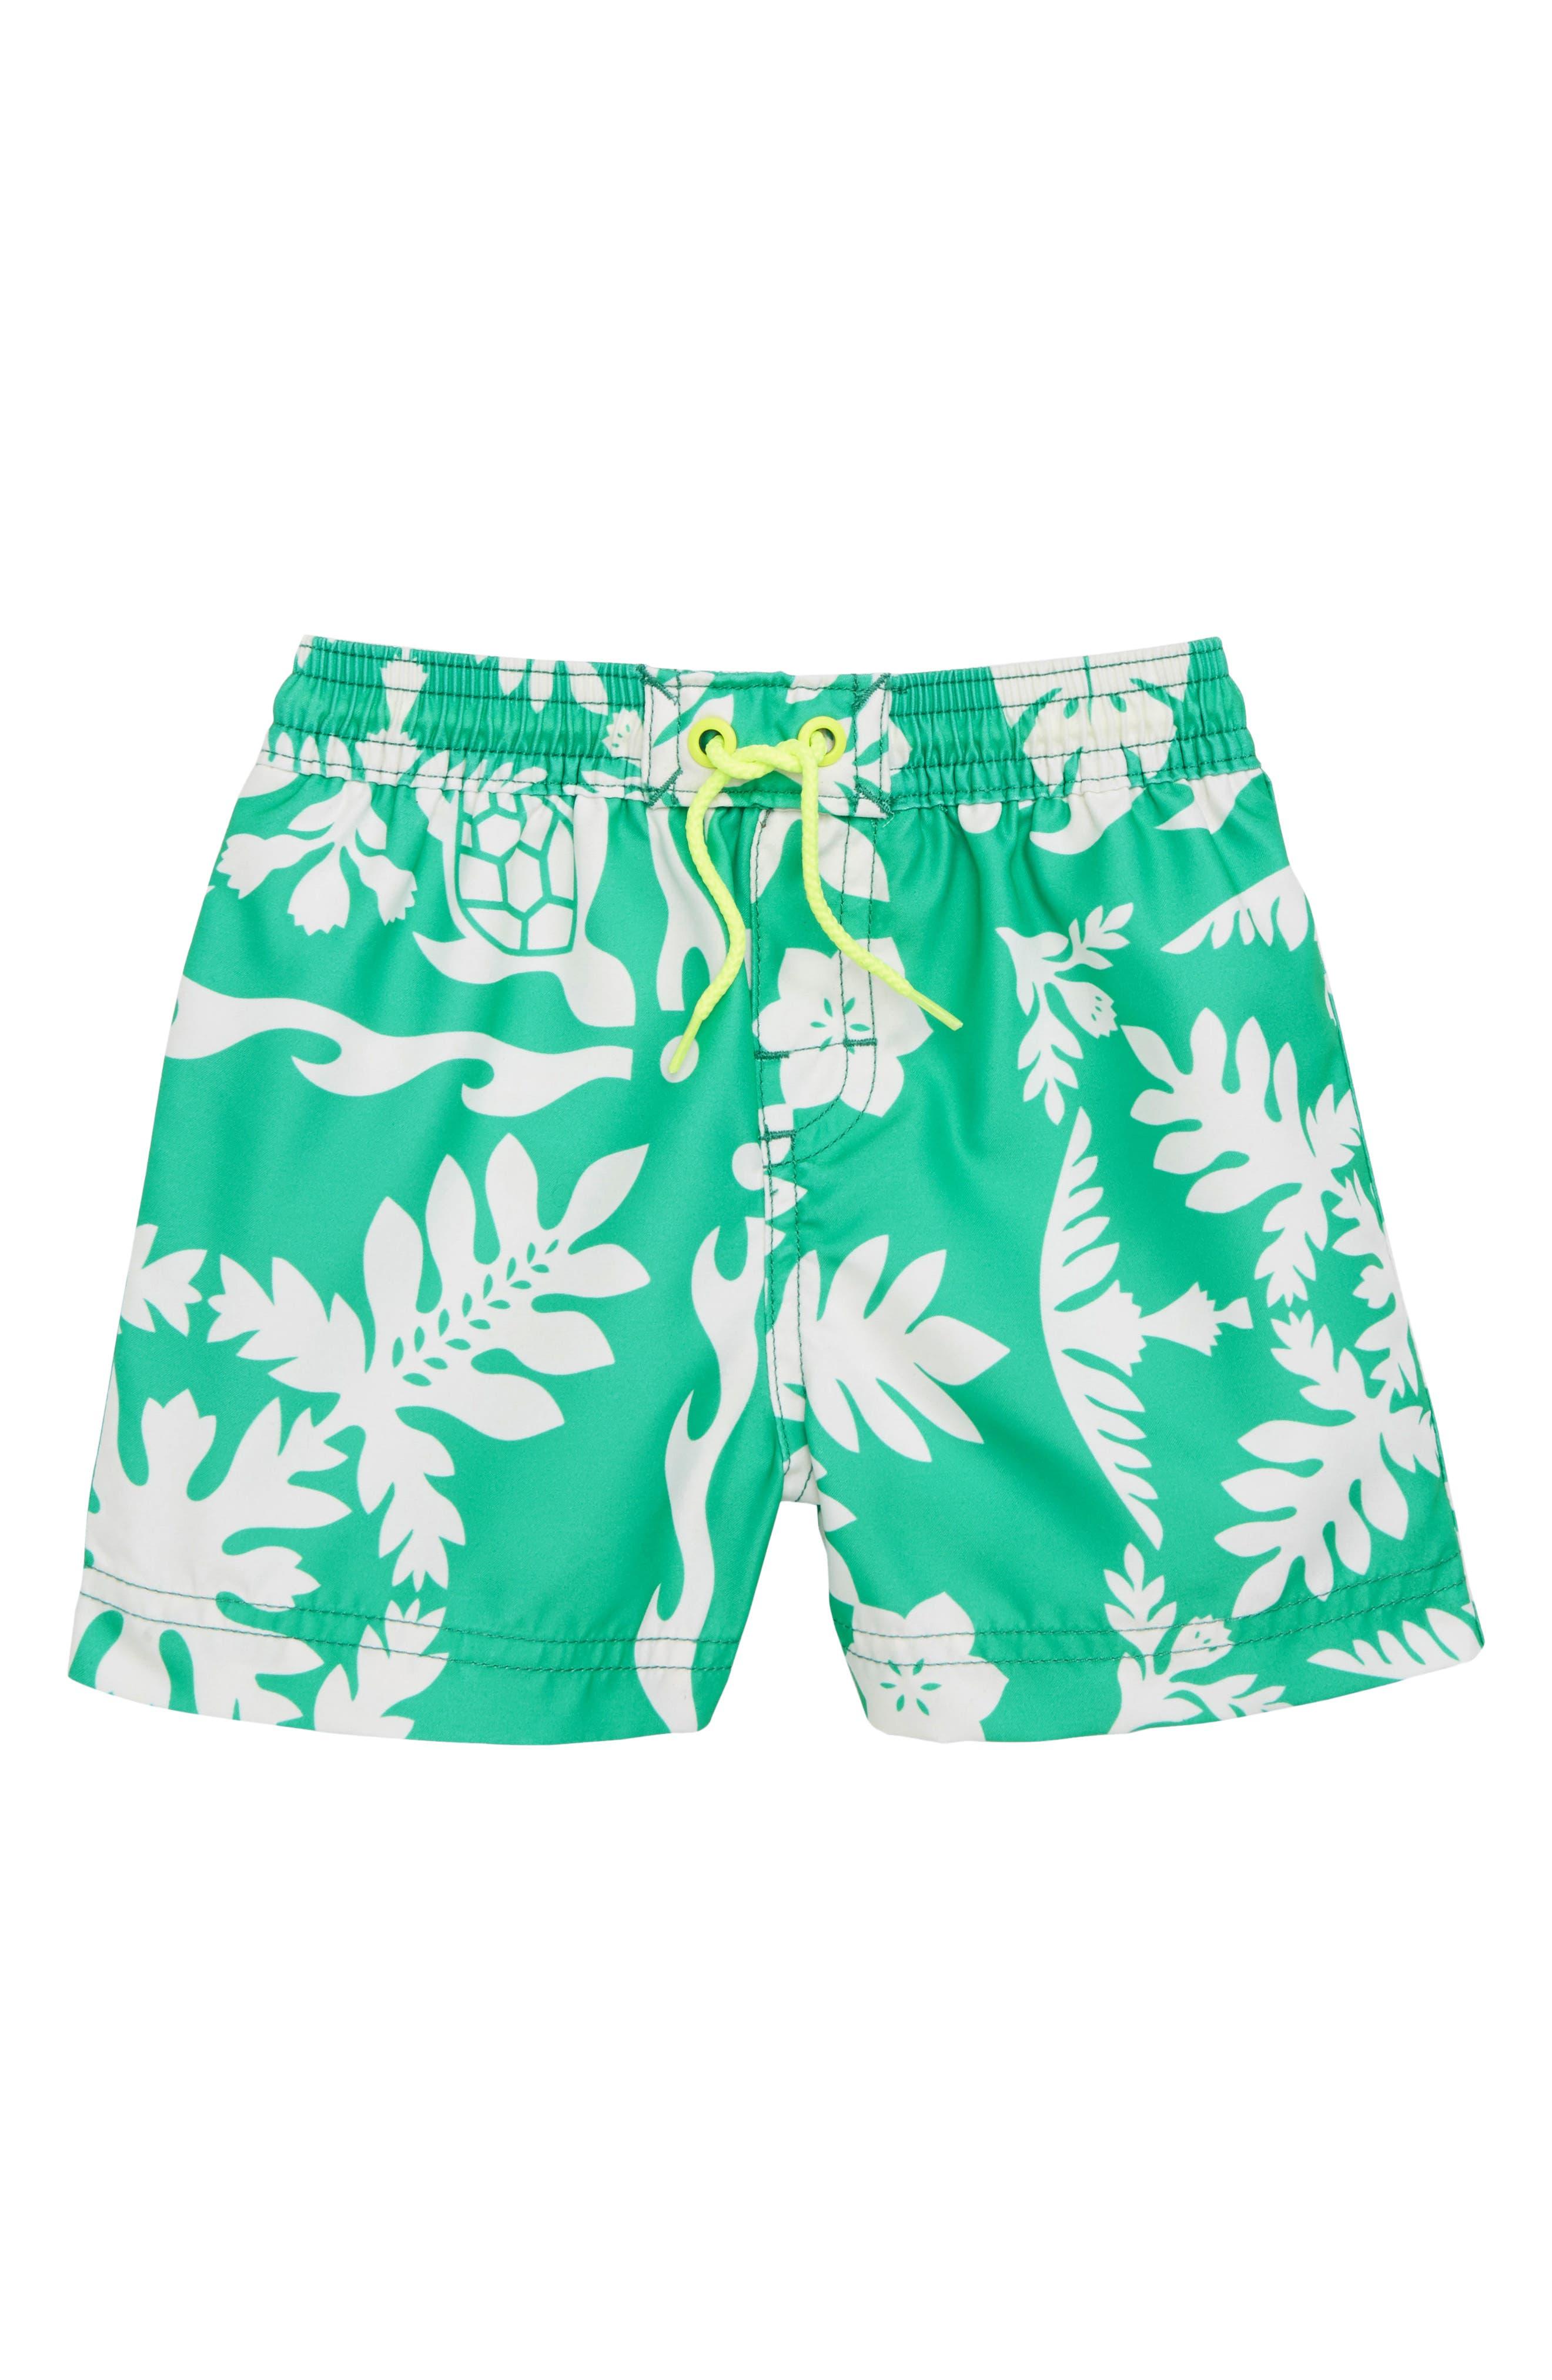 Print Swim Trunks,                         Main,                         color, Green Pop Hawaiian Quilt